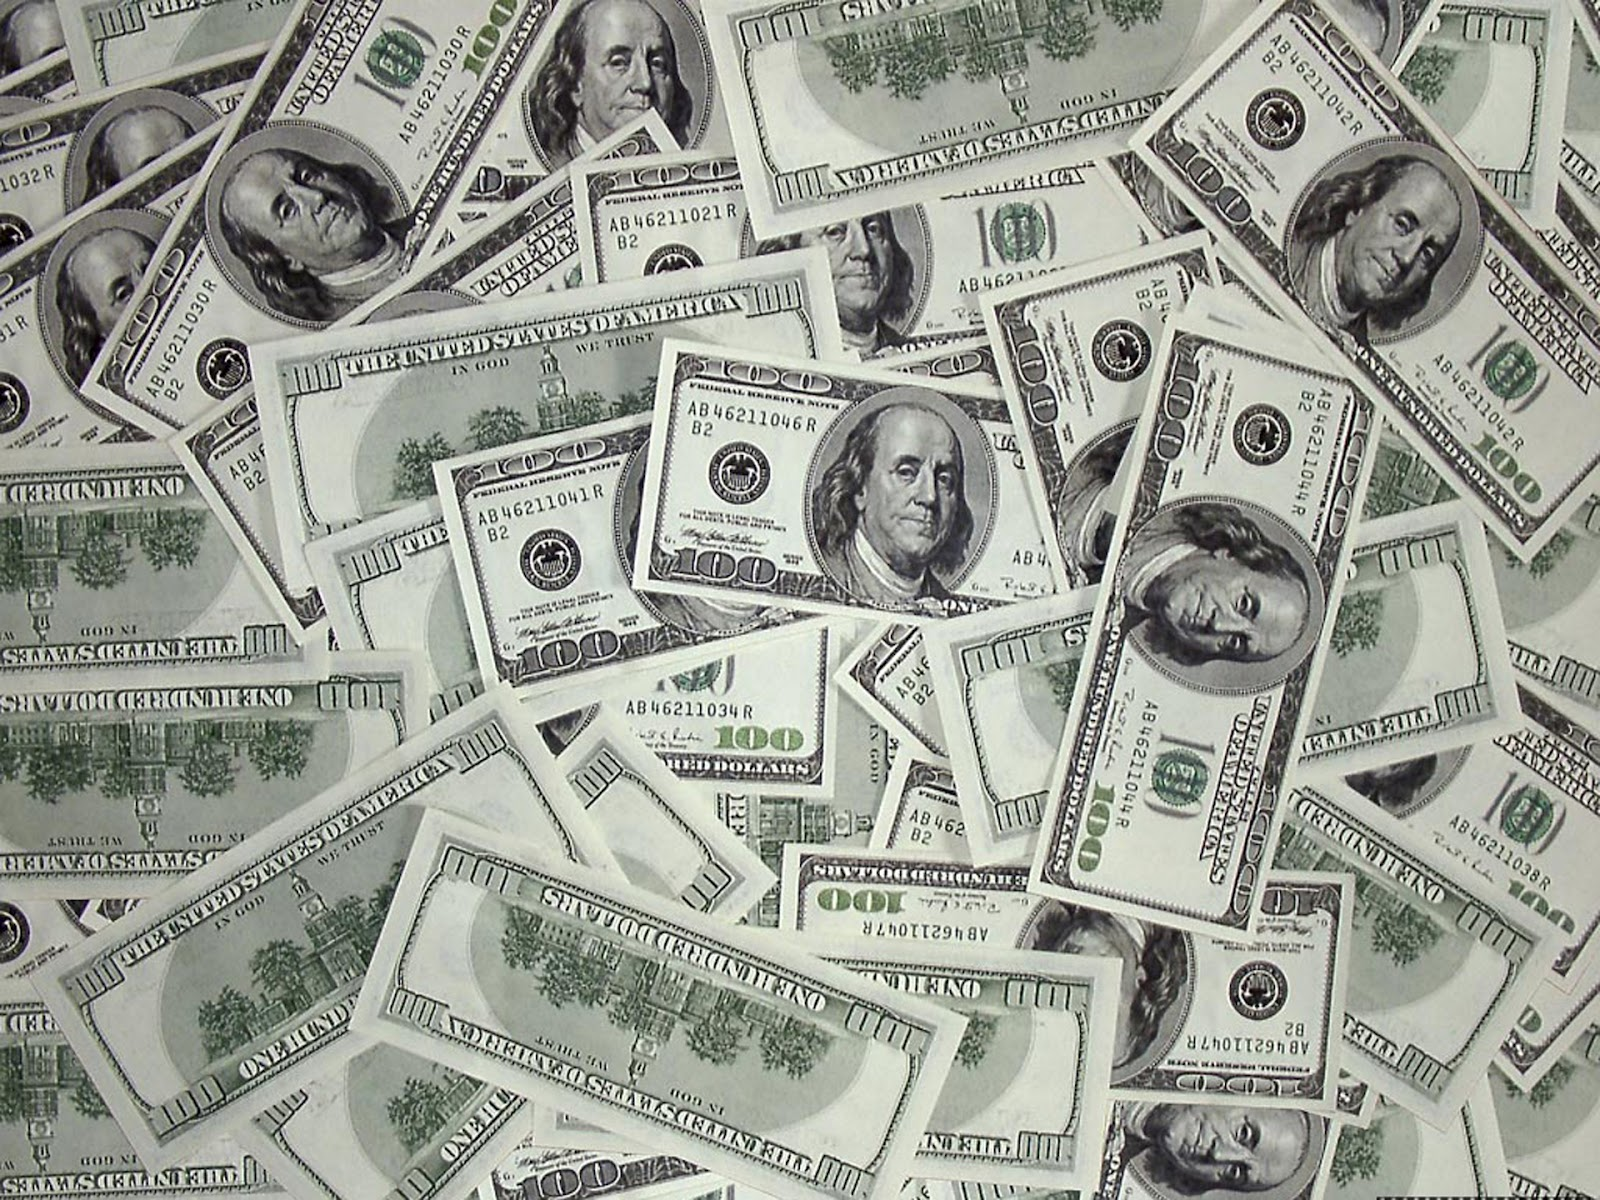 Payday loans suburban ave image 10